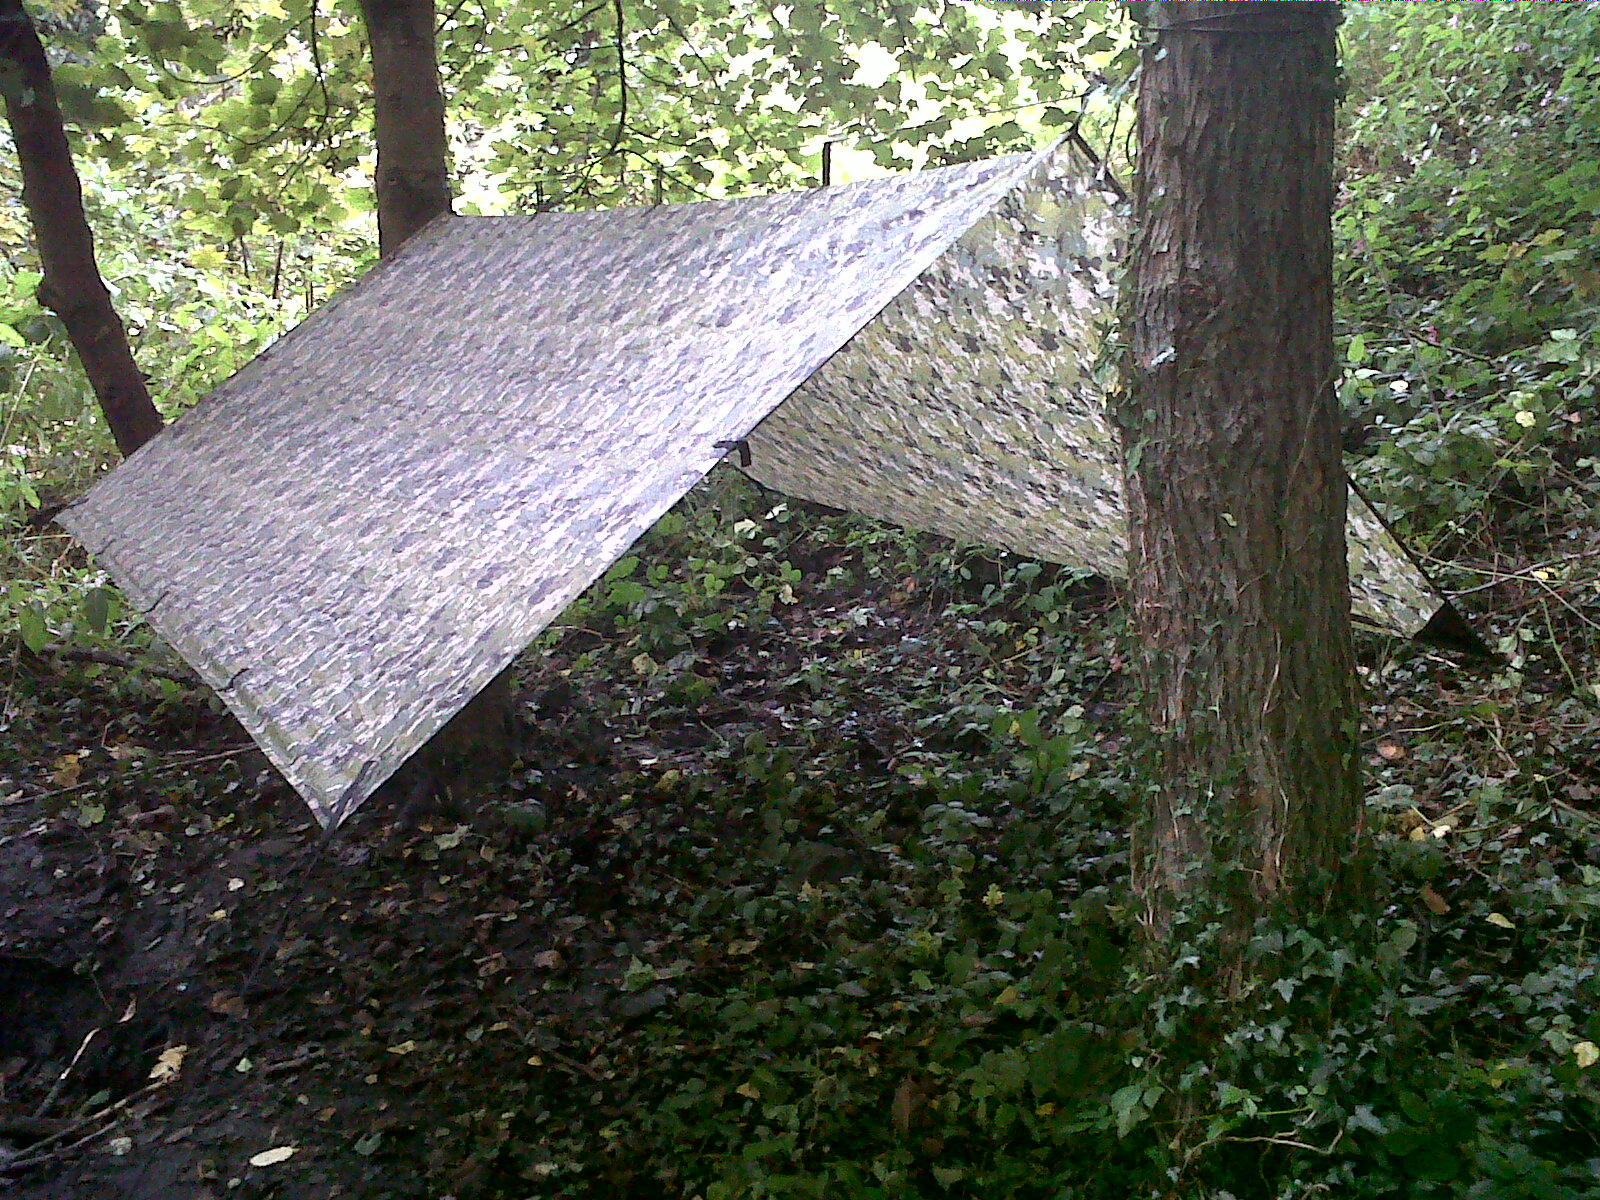 Backyard Hammock Setup : My Hammock setup is a DD 3x3m Tarp and a DD Camping Hammock